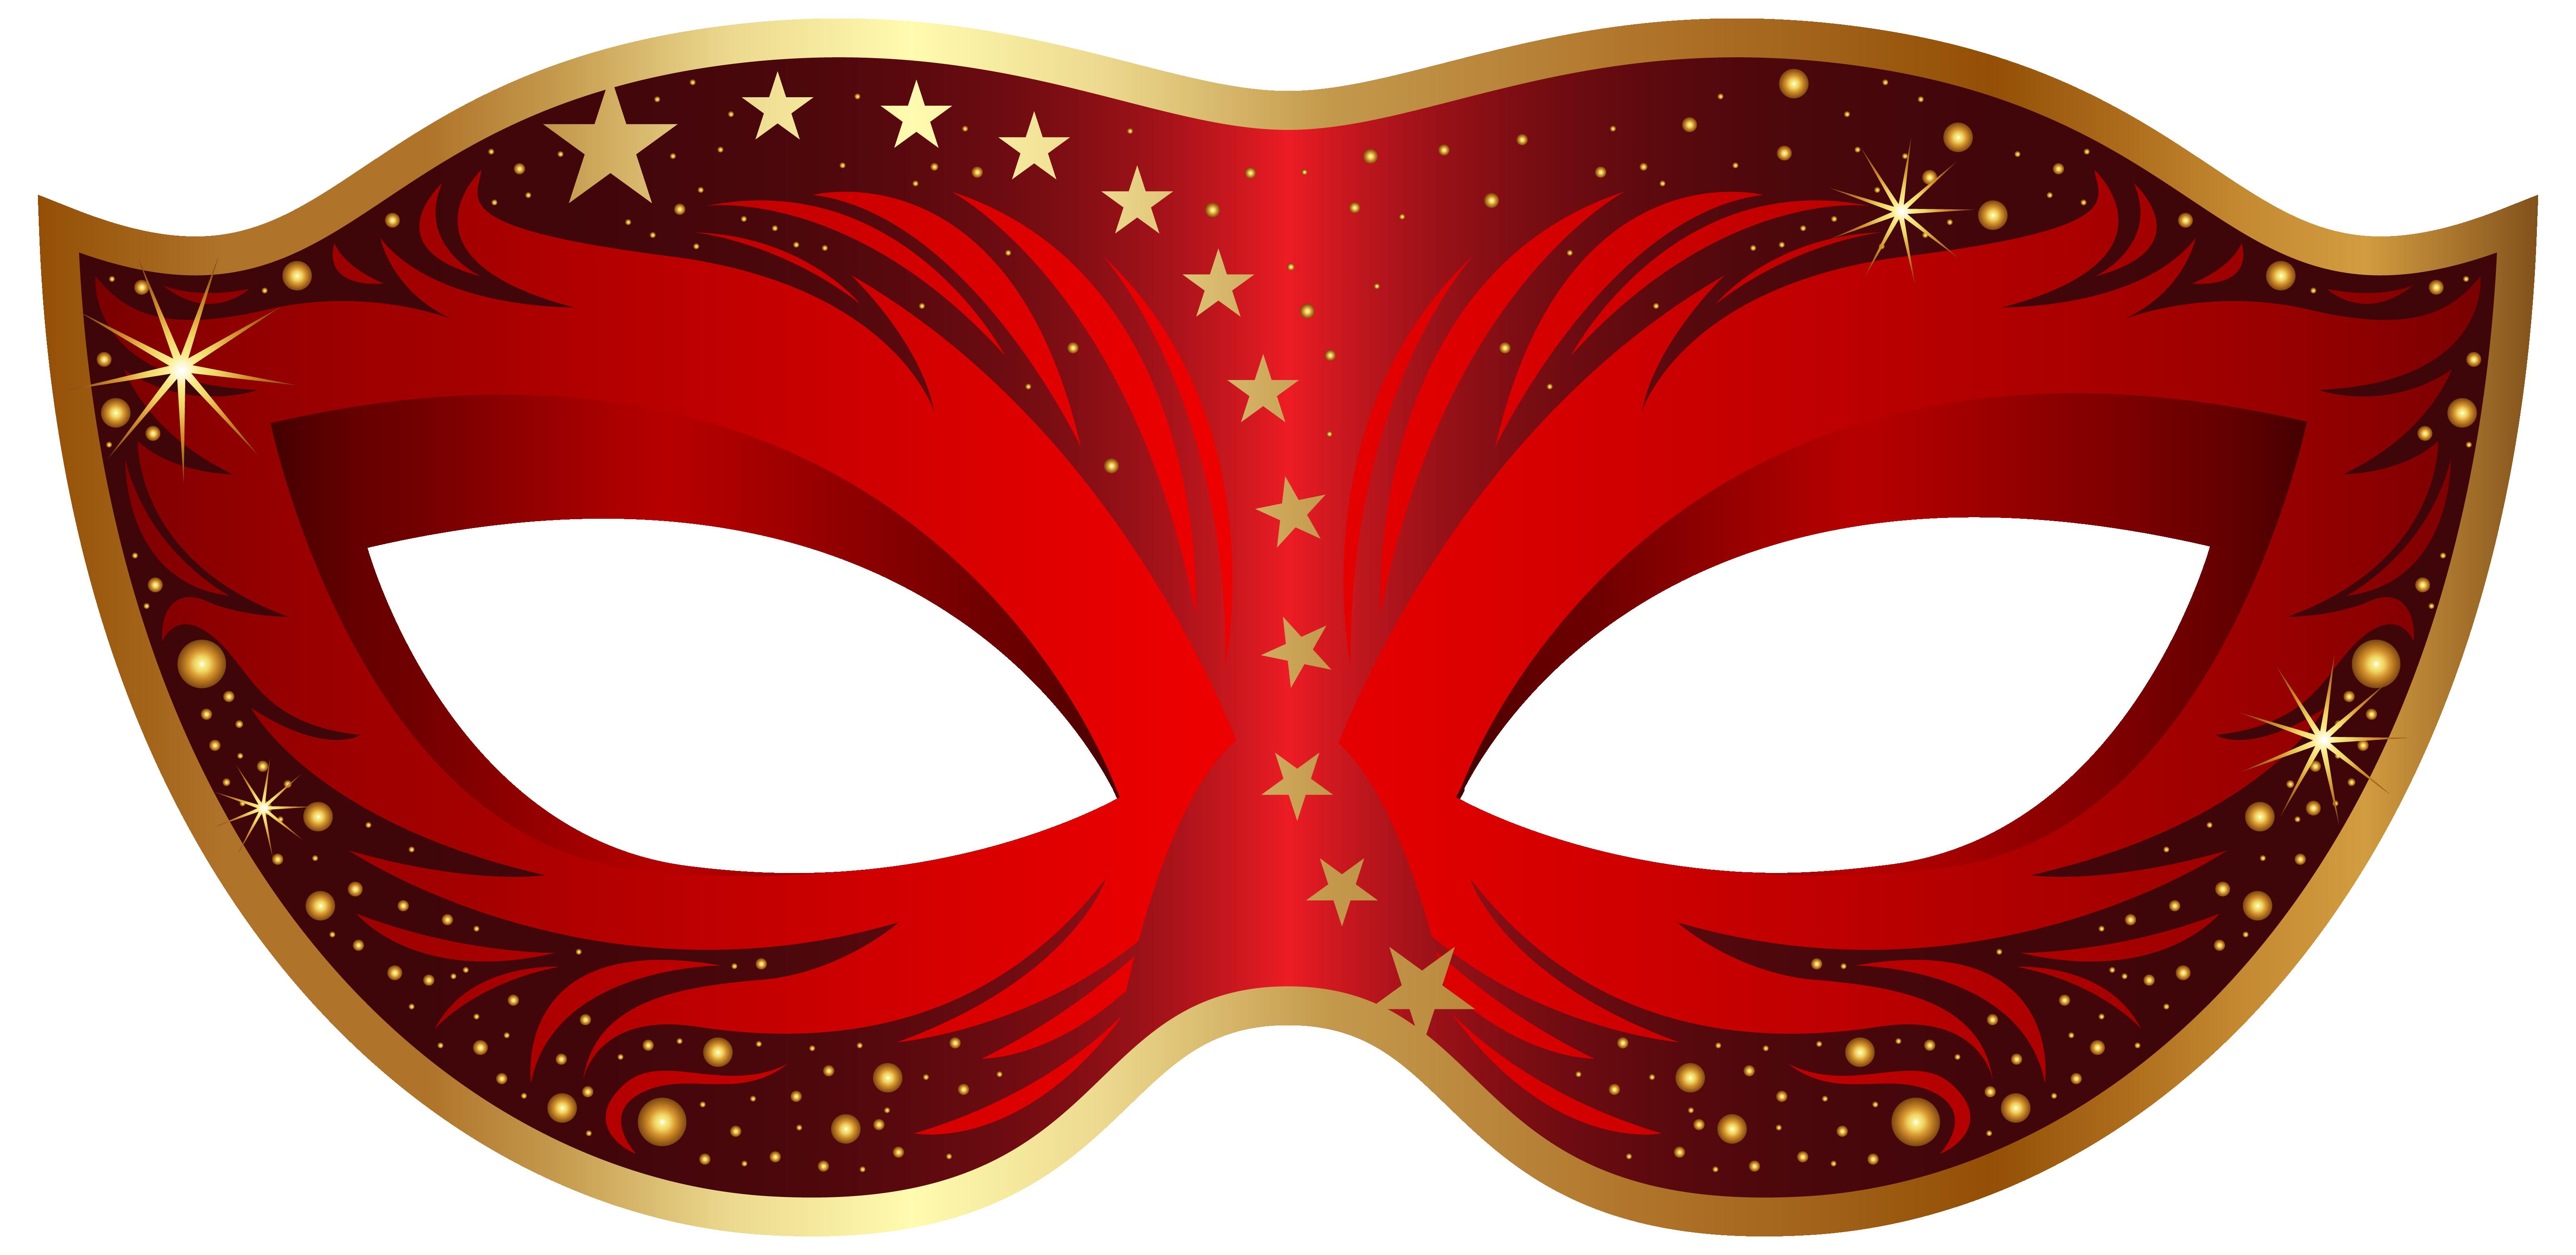 Red carnival mask clip art image